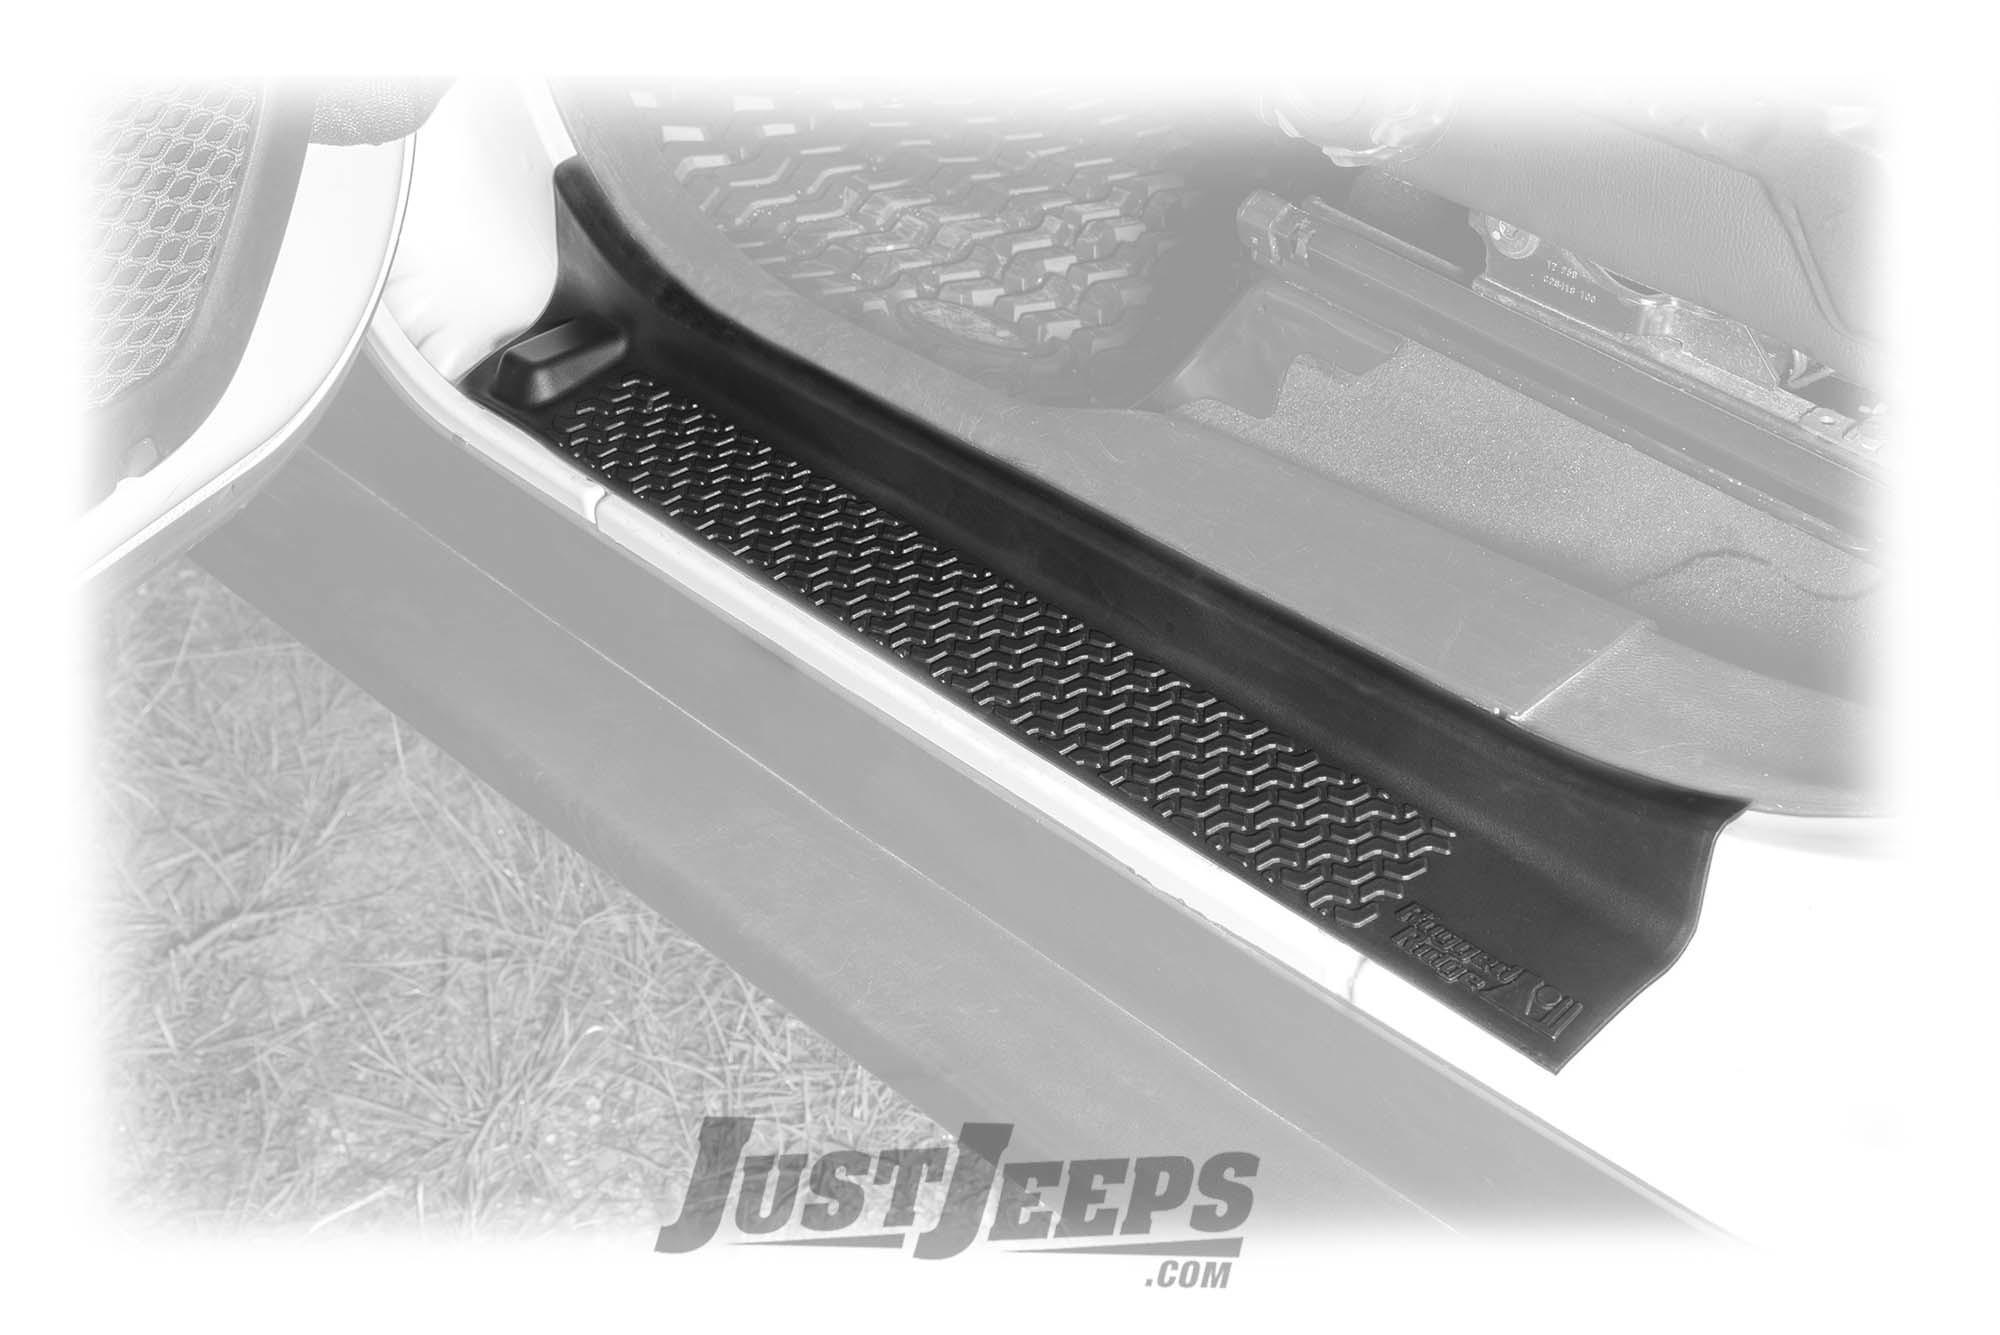 Rugged Ridge Front Entry Guards For 2018+ Jeep Gladiator JT & Wrangler JL 2 Door & Unlimited 4 Door Models